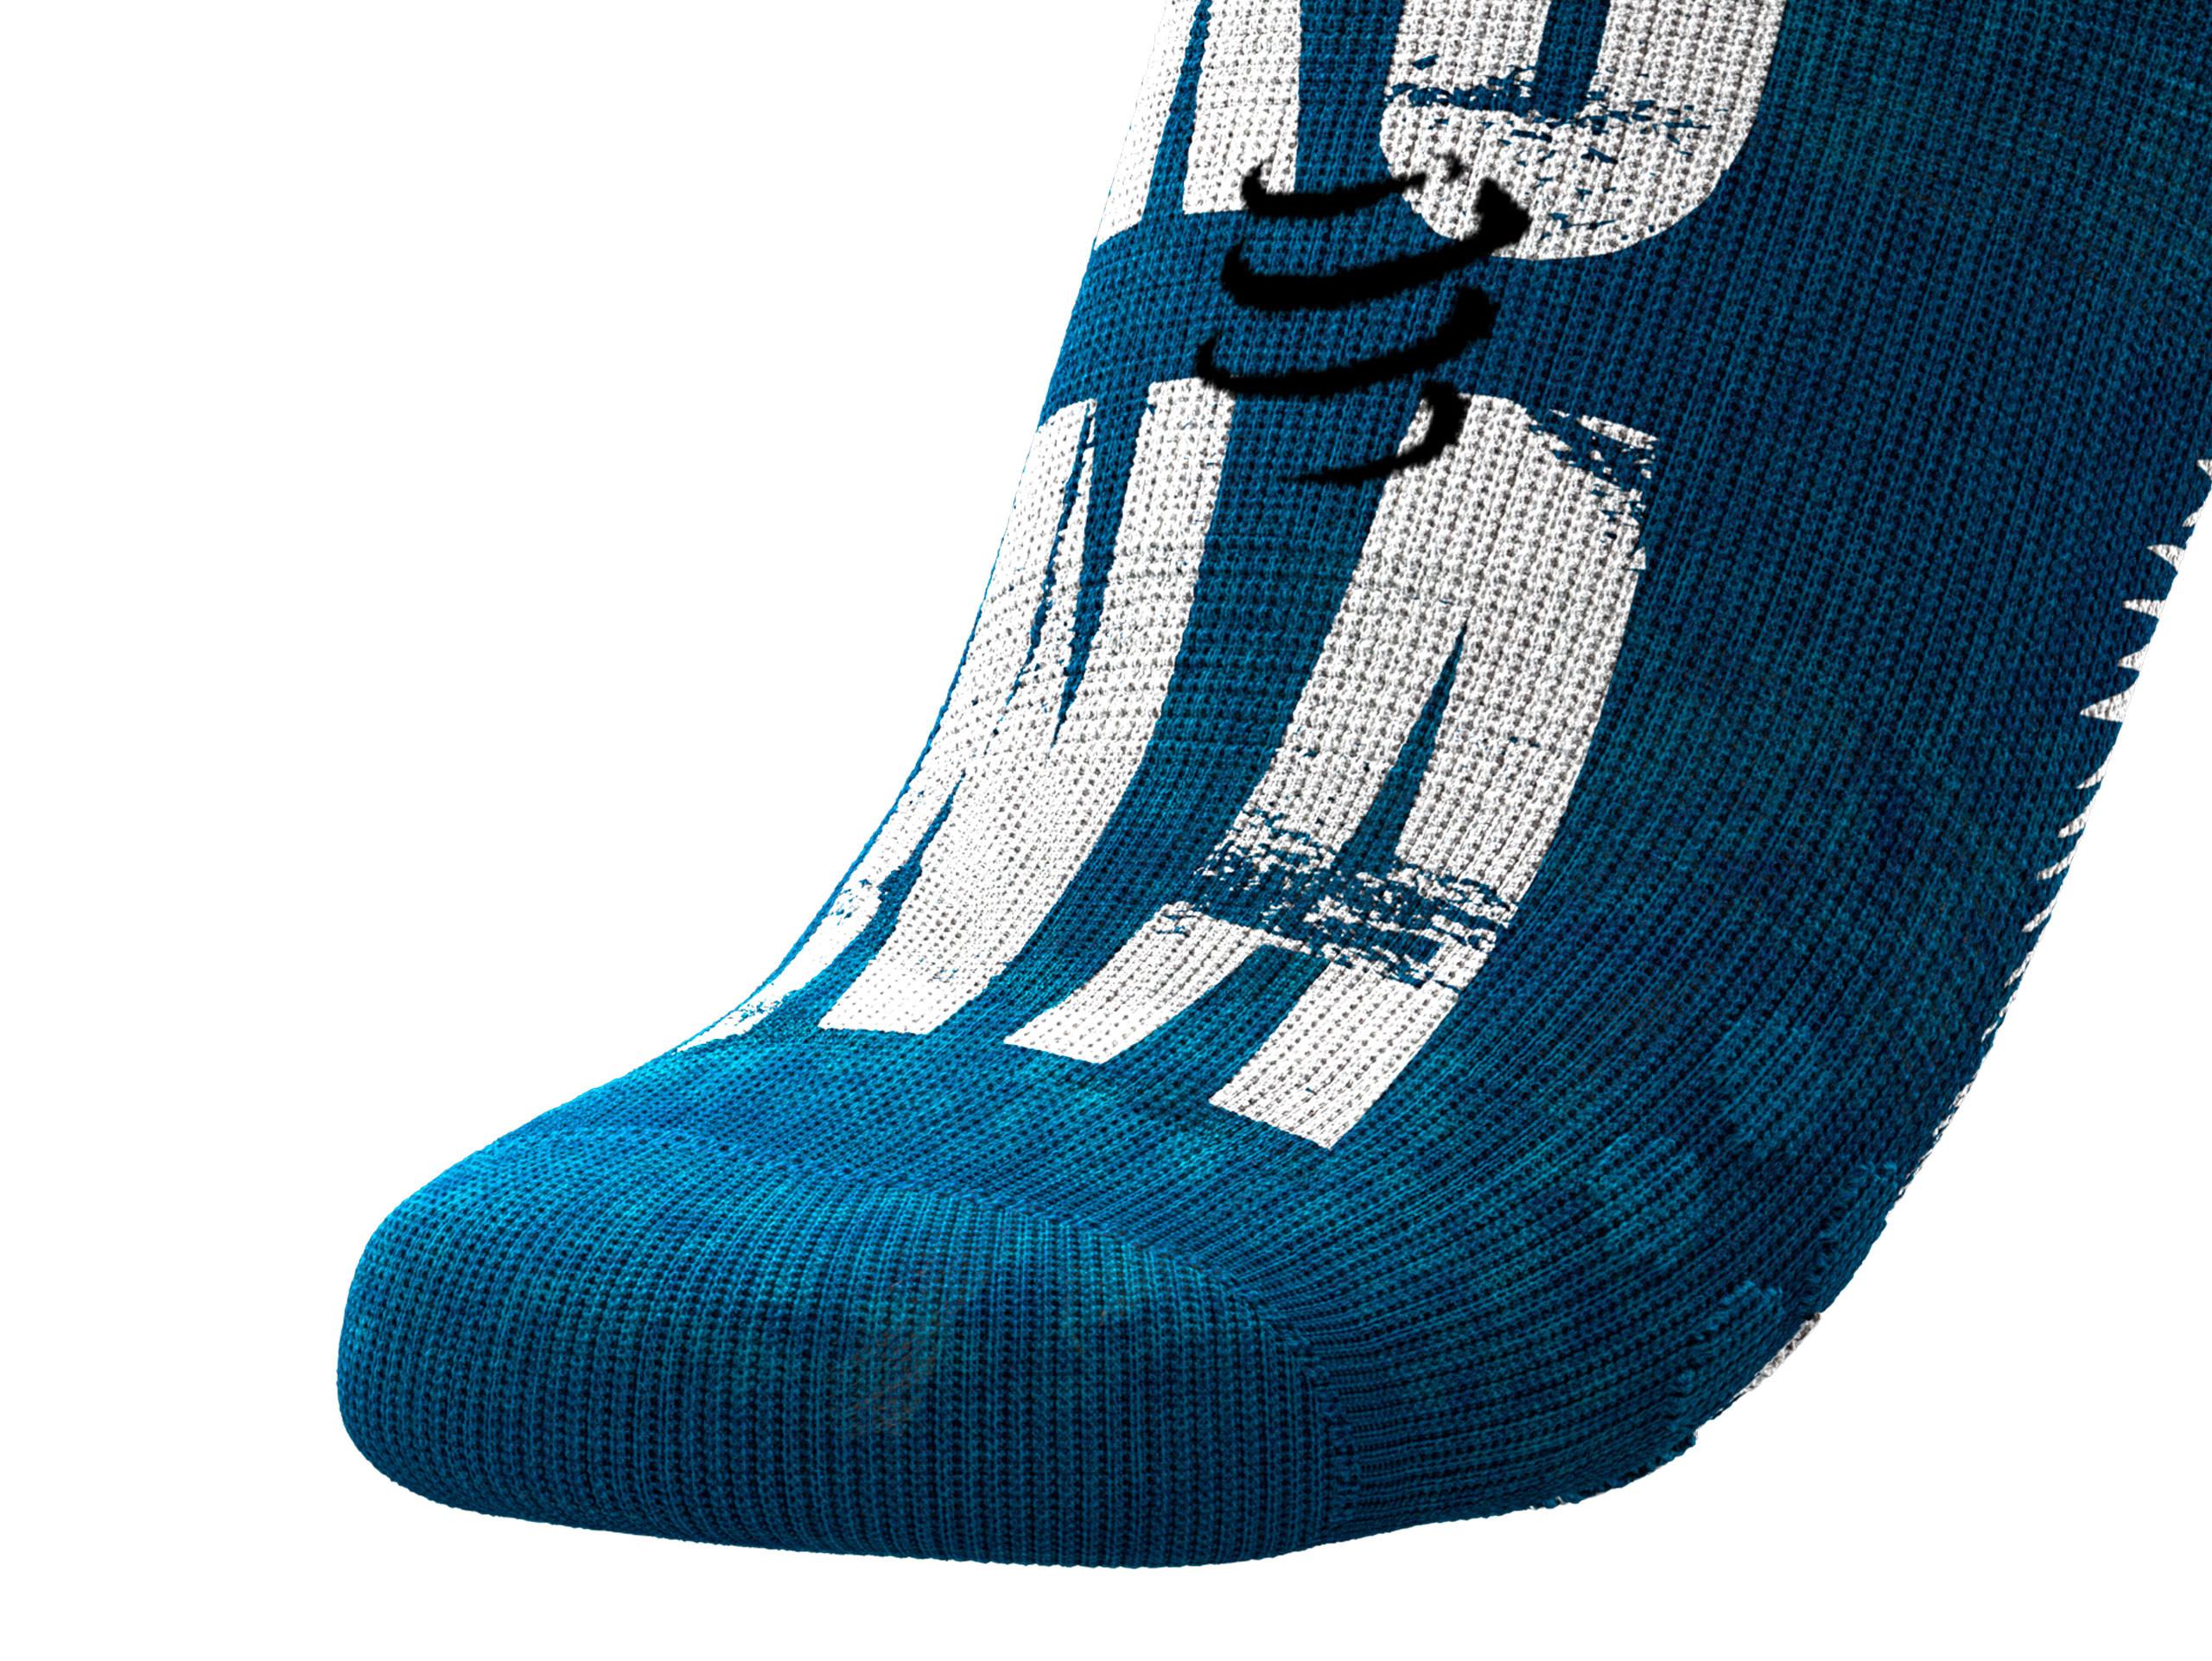 Pro Racing Socks v3.0 Ultralight Run Low - Kona 2019